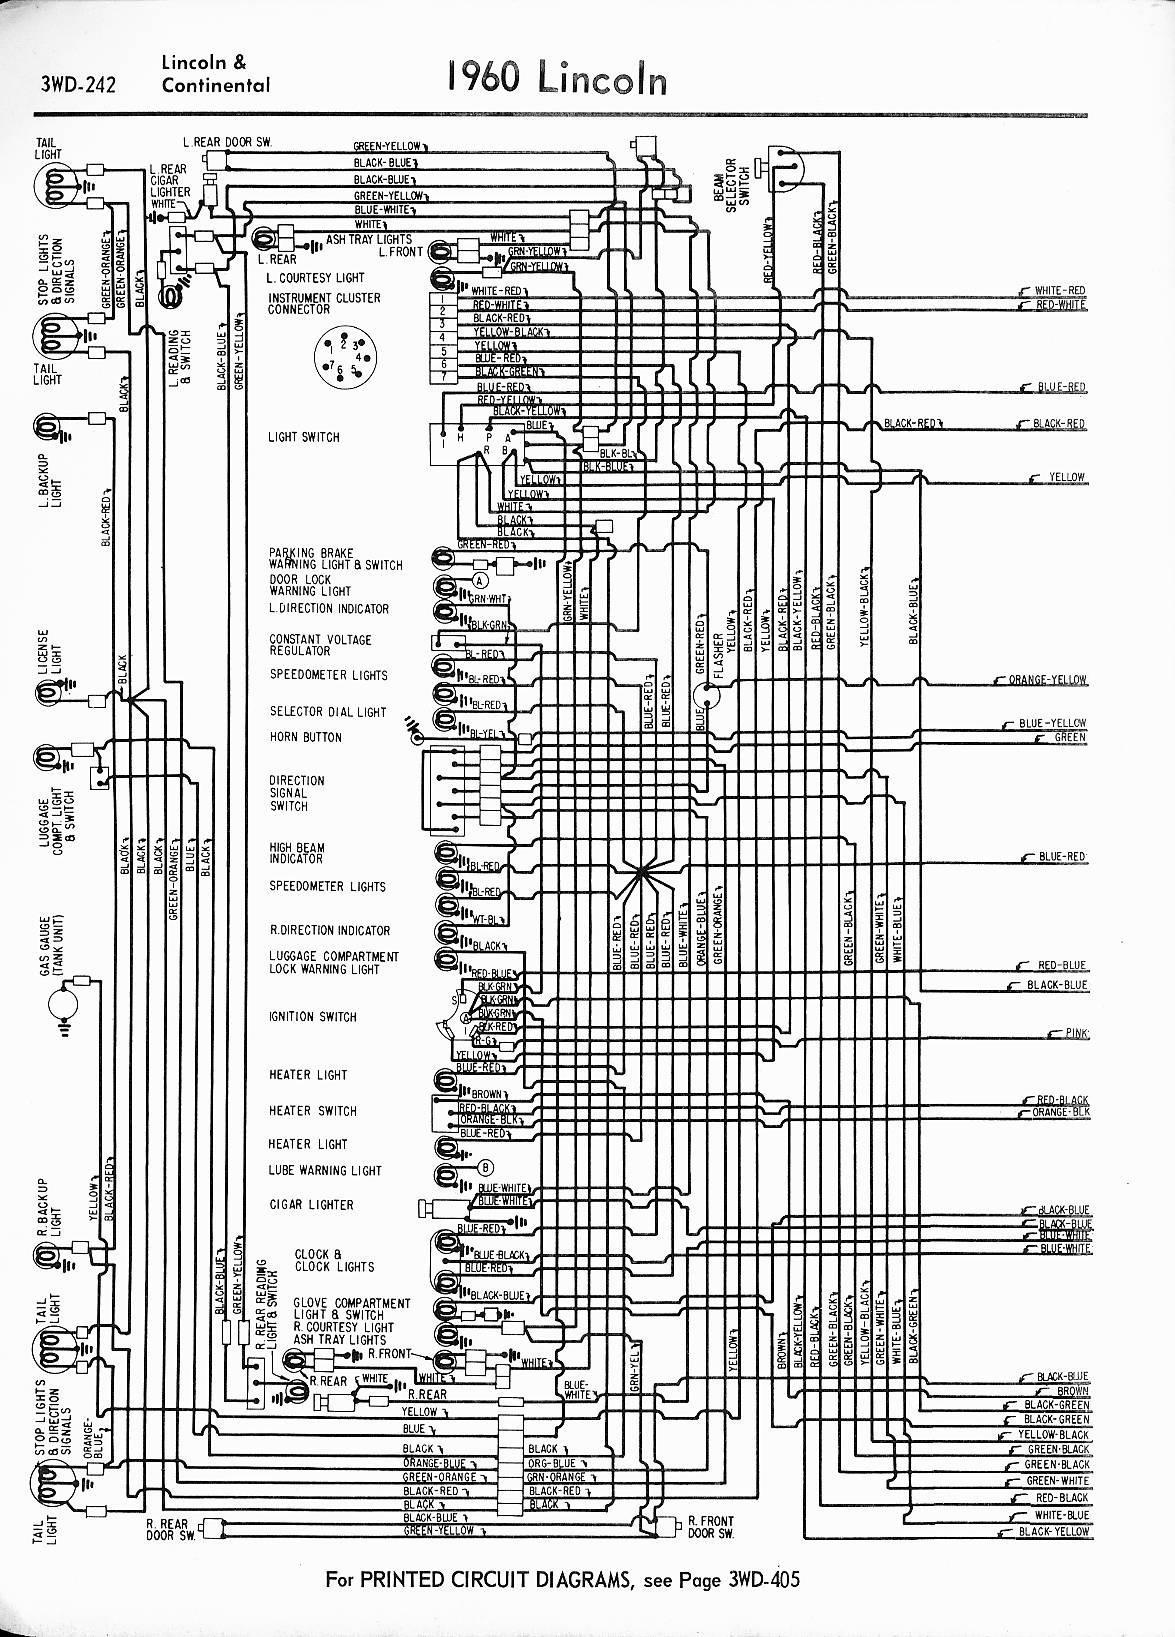 2001 Lincoln Navigator Engine Diagram Wiring Diagram 1975 Lincoln Worksheet and Wiring Diagram • Of 2001 Lincoln Navigator Engine Diagram